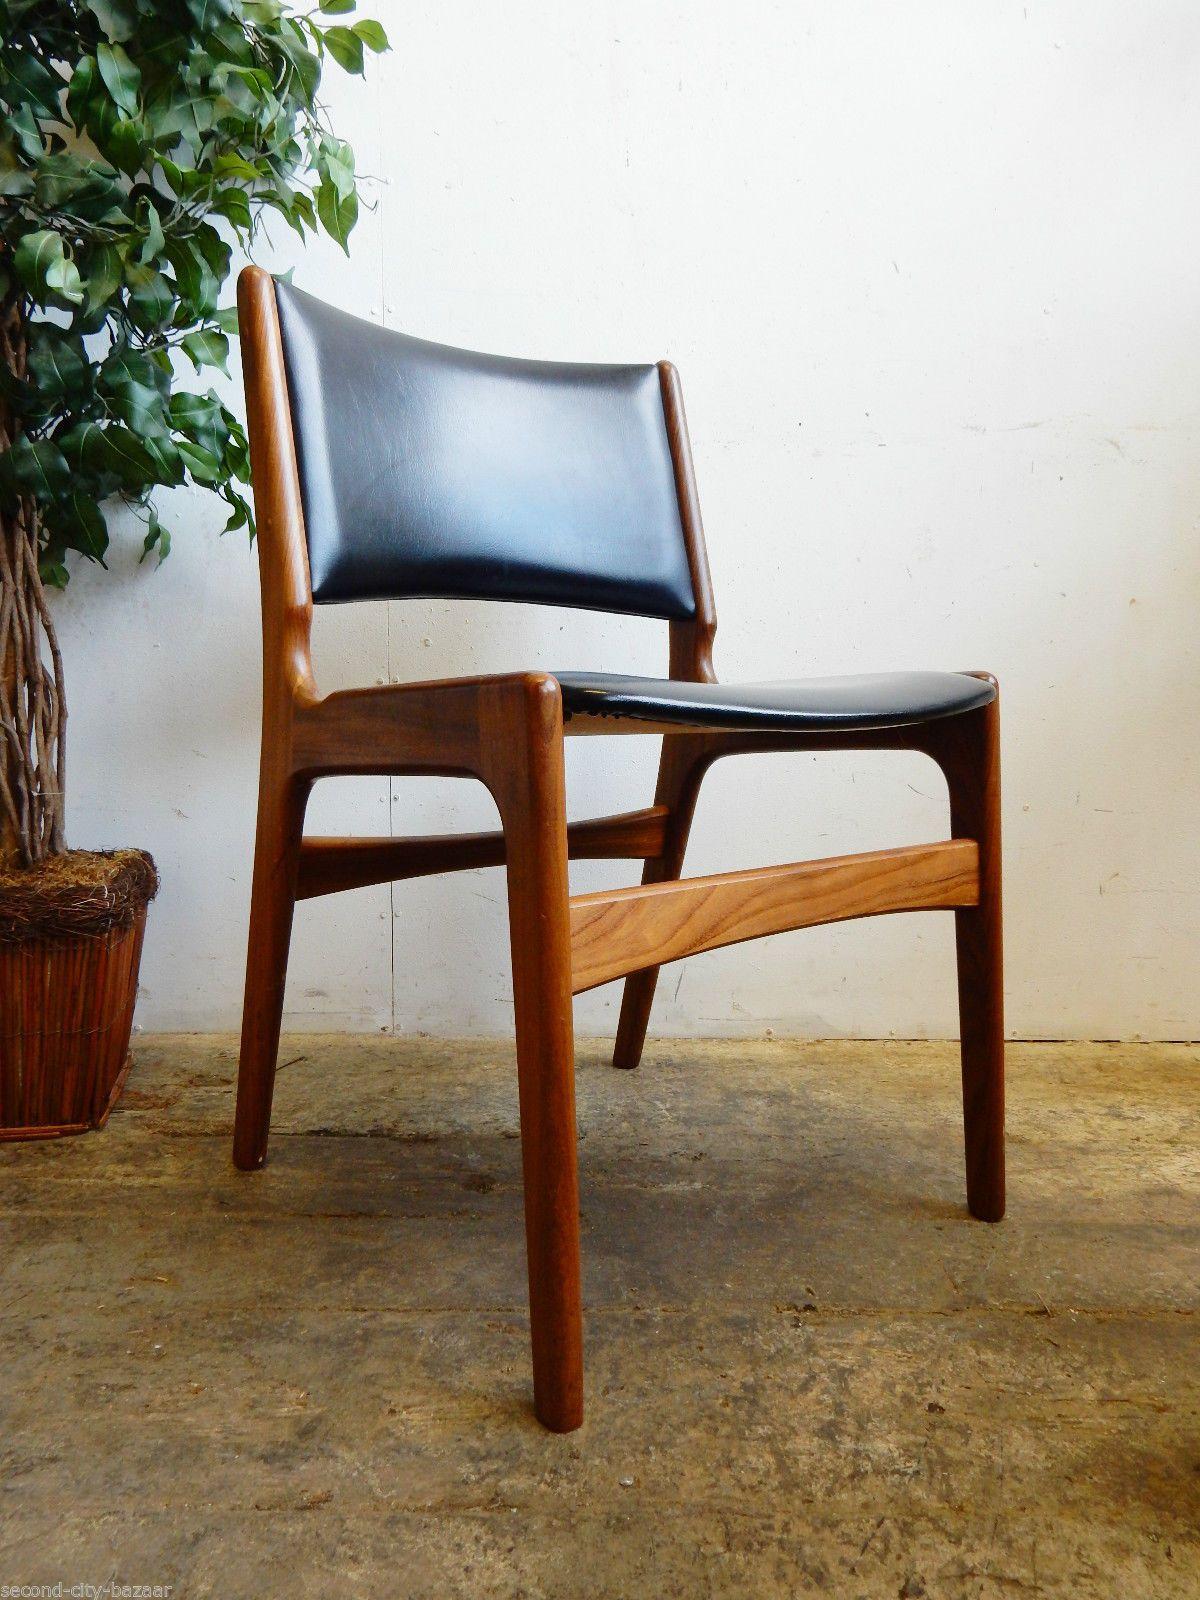 vintage 60s furniture. Dining Chairs · Vintage 60s Furniture Y